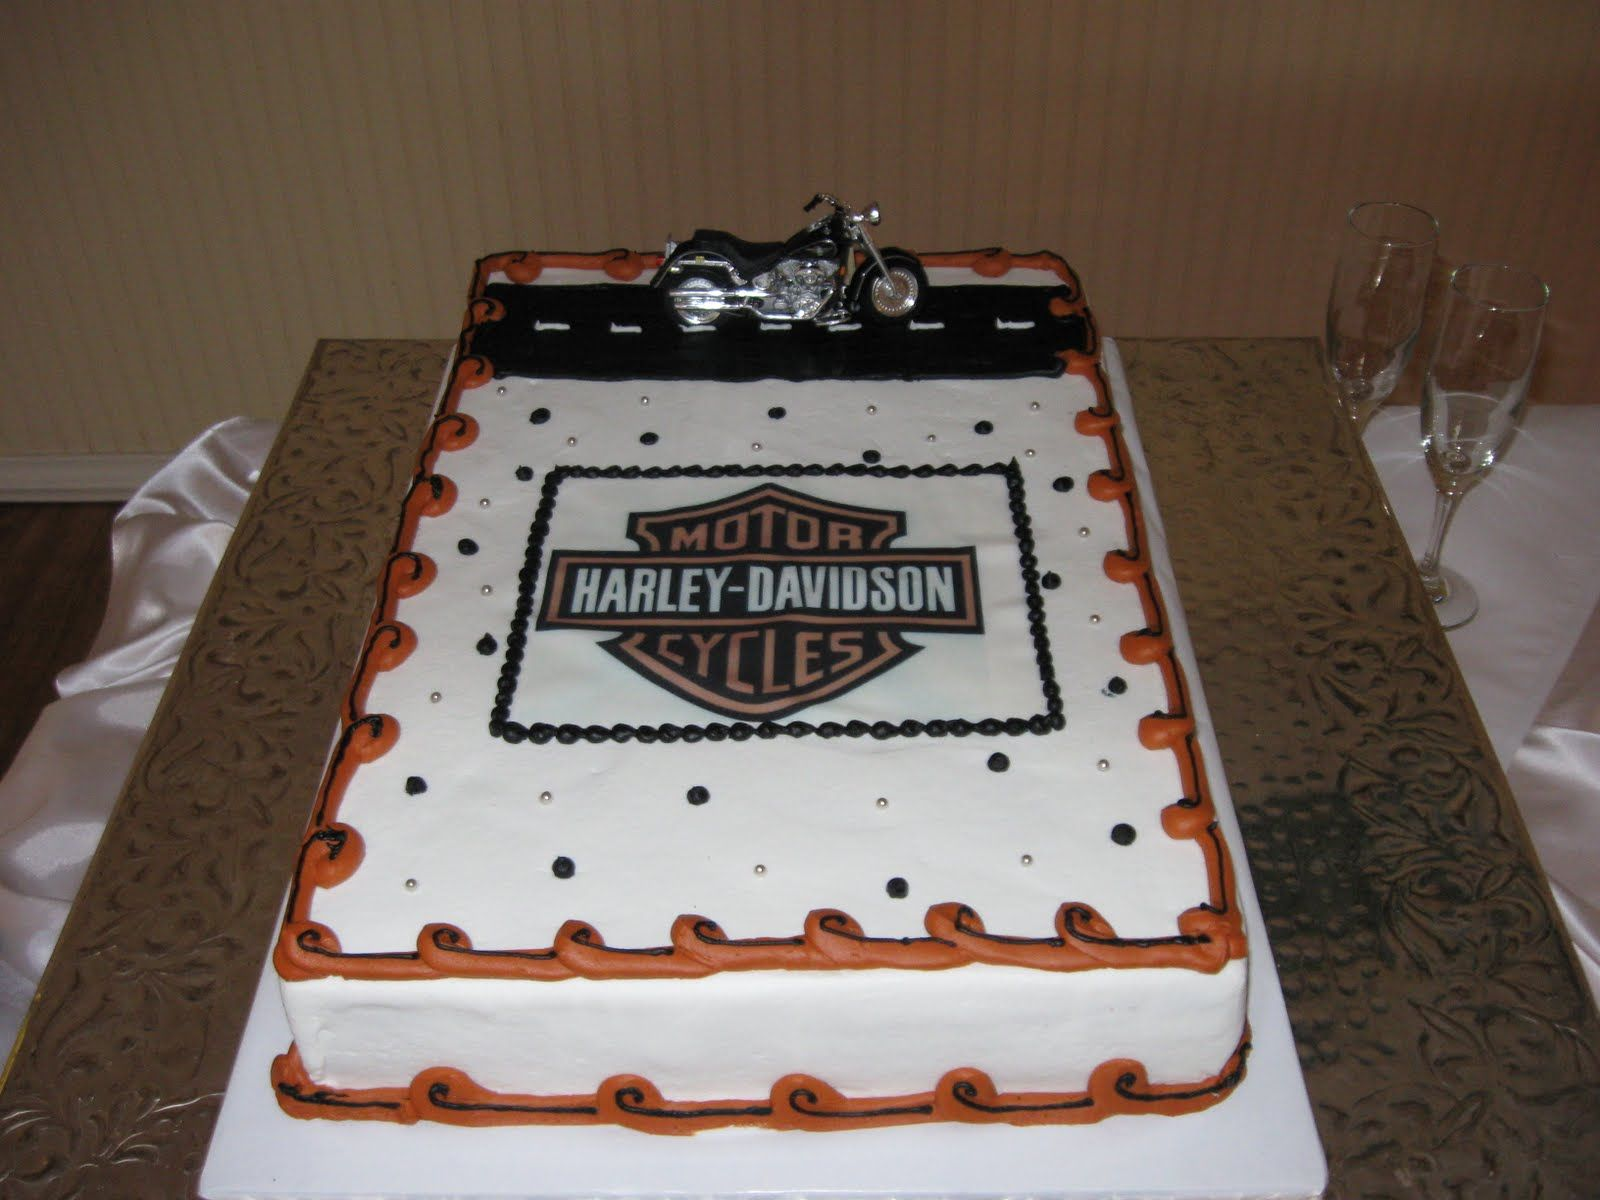 Harley-Davidson Wedding Ideas | Harley-Davidson Groom\'s Cake and ...